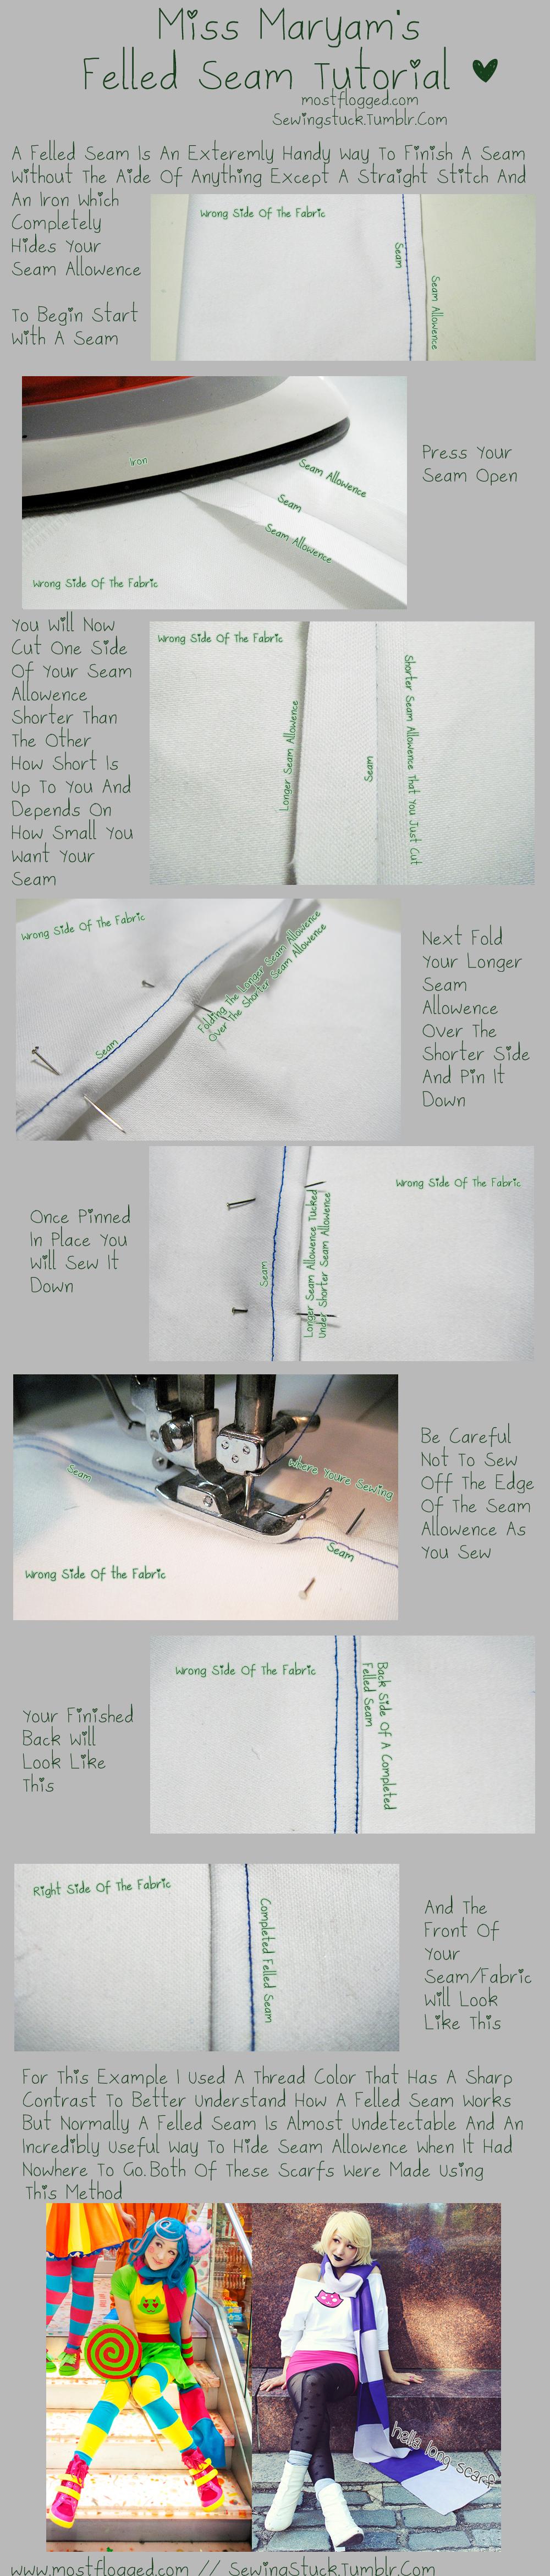 Sewingstuck - Felled Seam Tutorial by Mostflogged